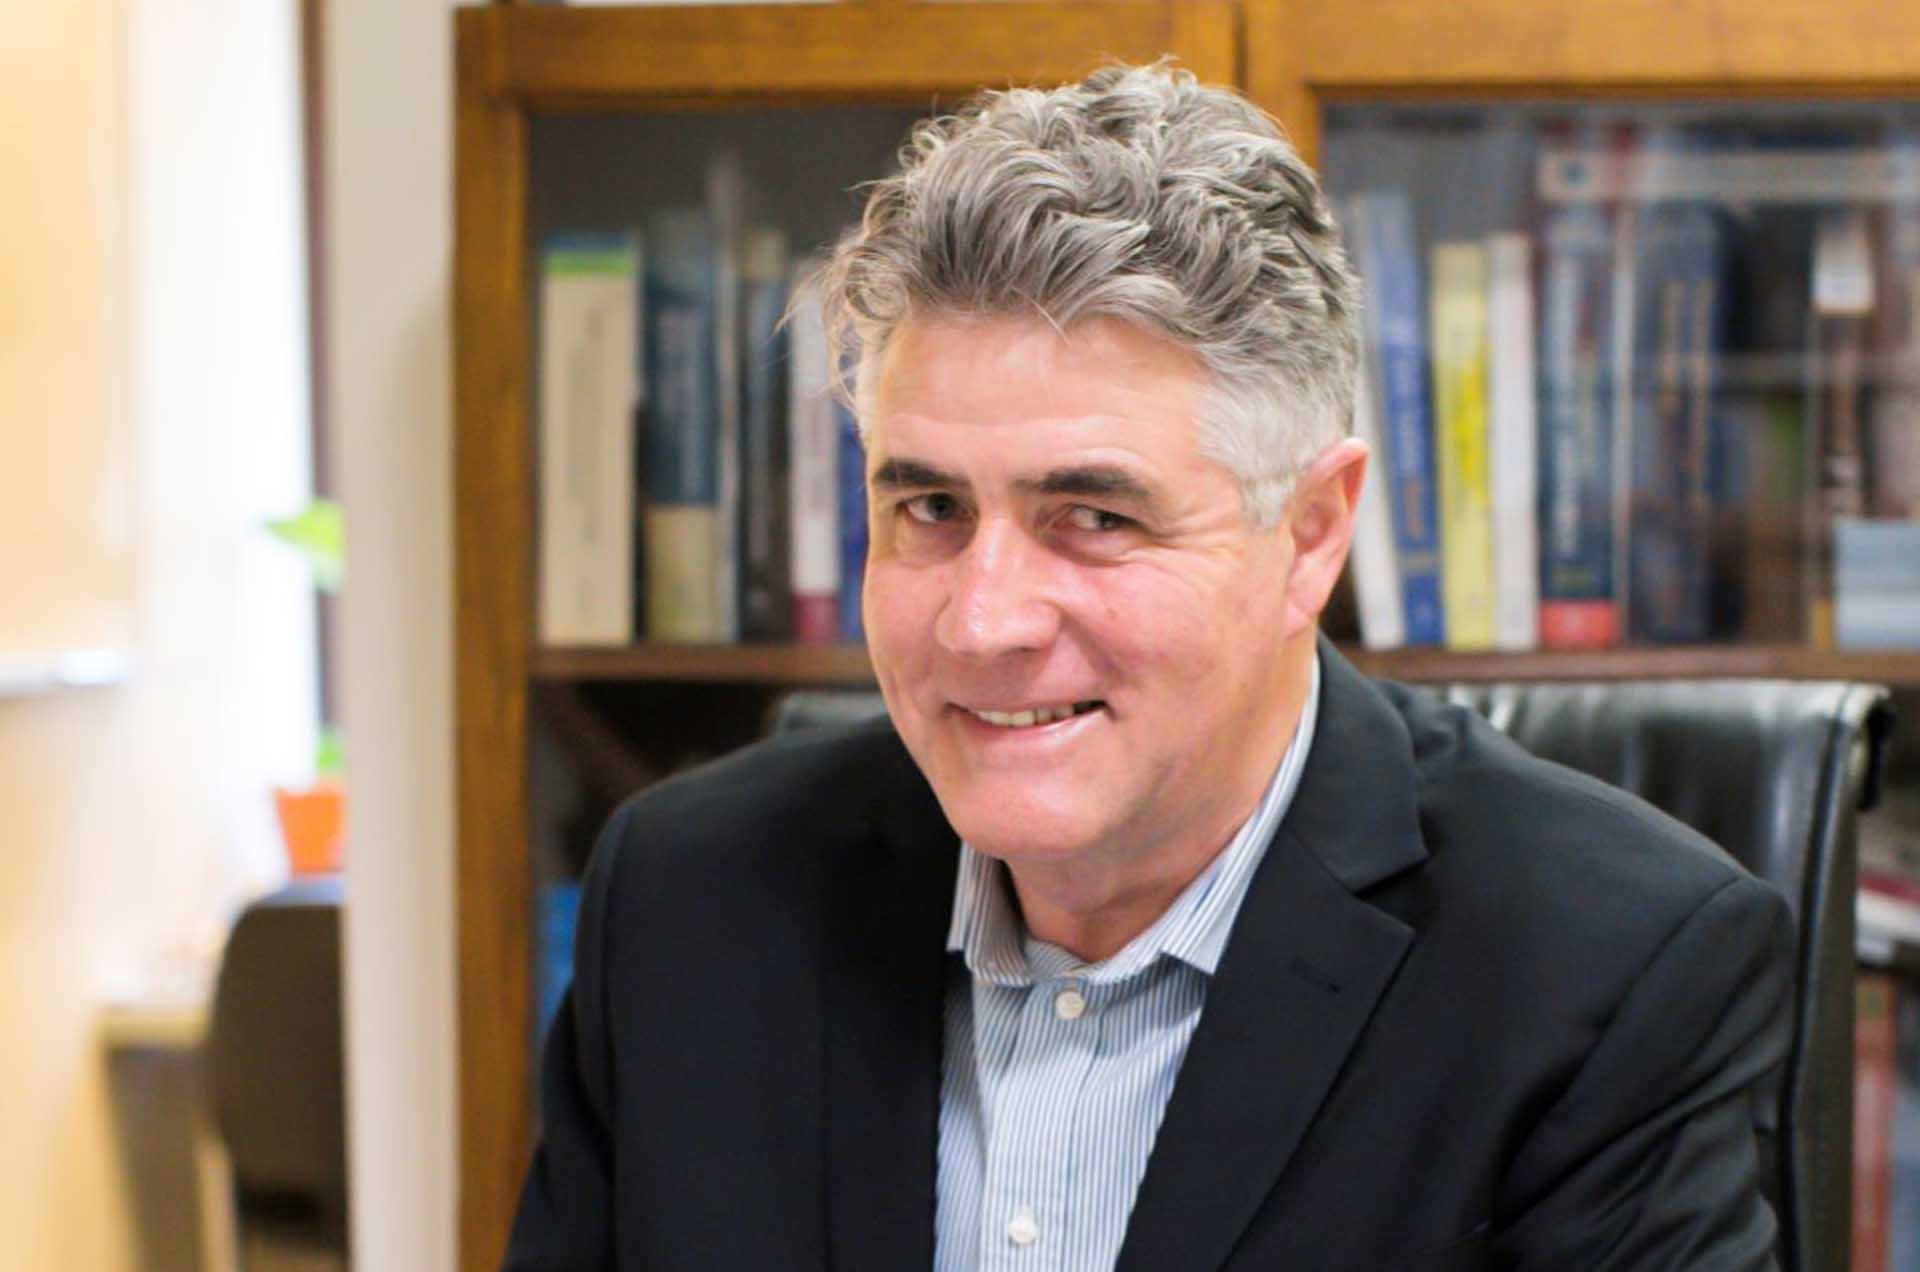 Dr John Kearney